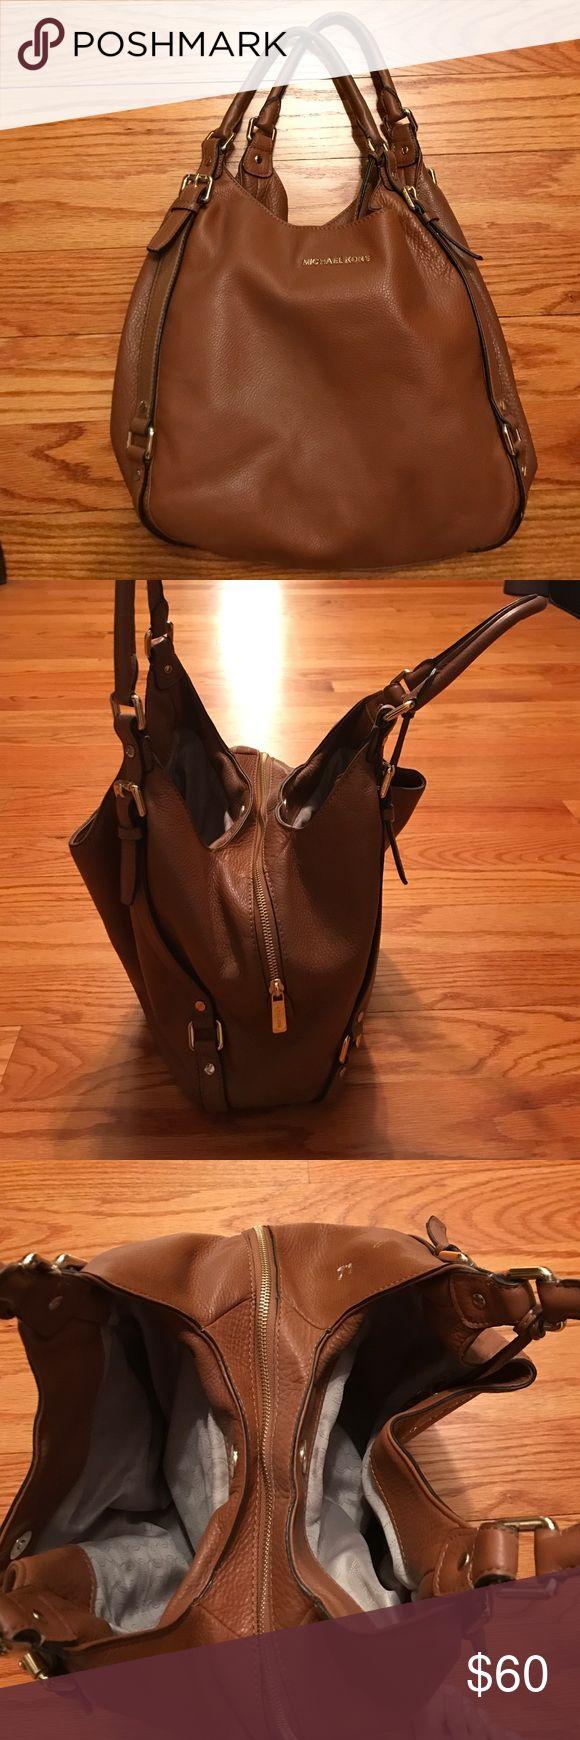 Micheal kors handbag Beautiful like new  very spacious KORS Michael Kors Bags Shoulder Bags